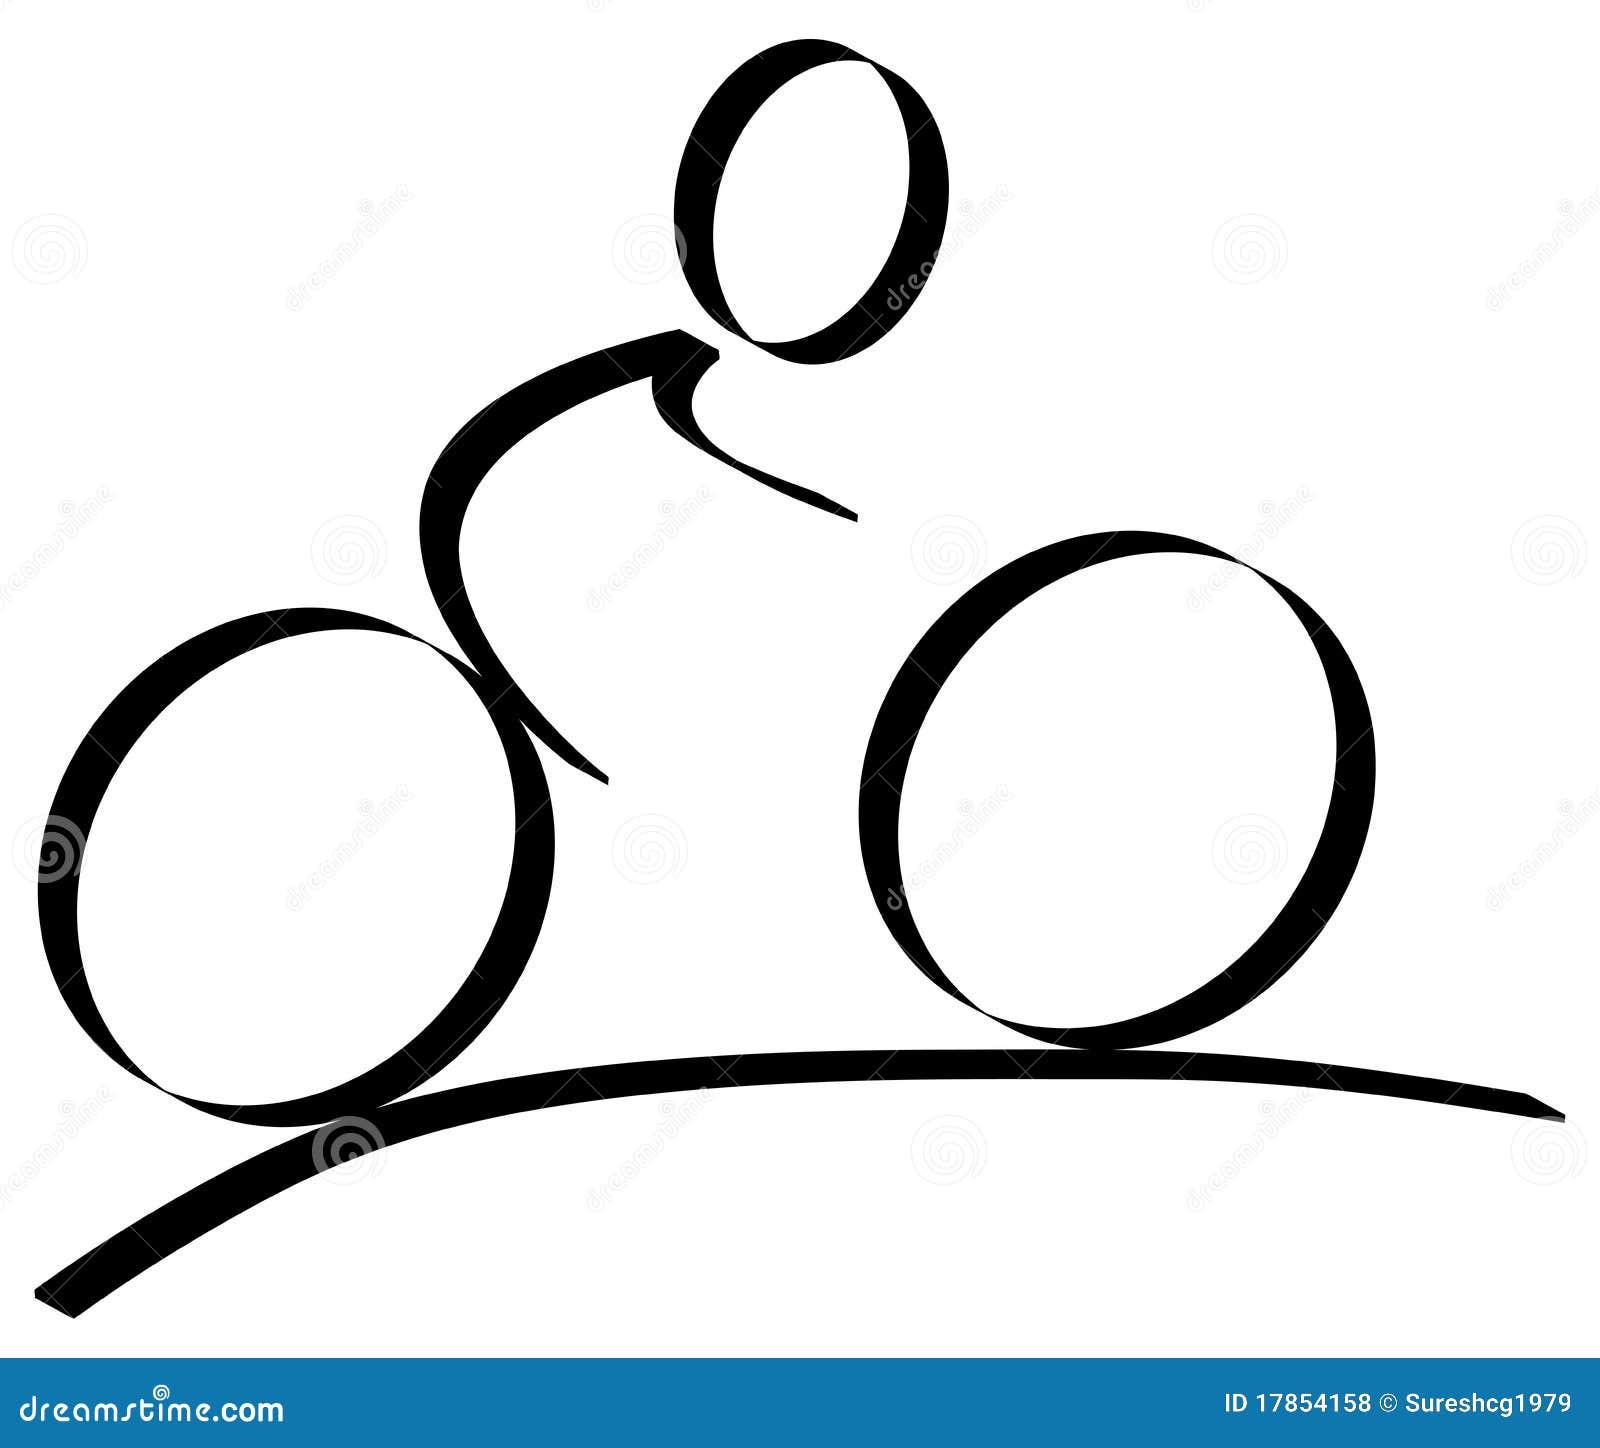 Cycling Logo Royalty Free Stock Photos - Image: 17854158